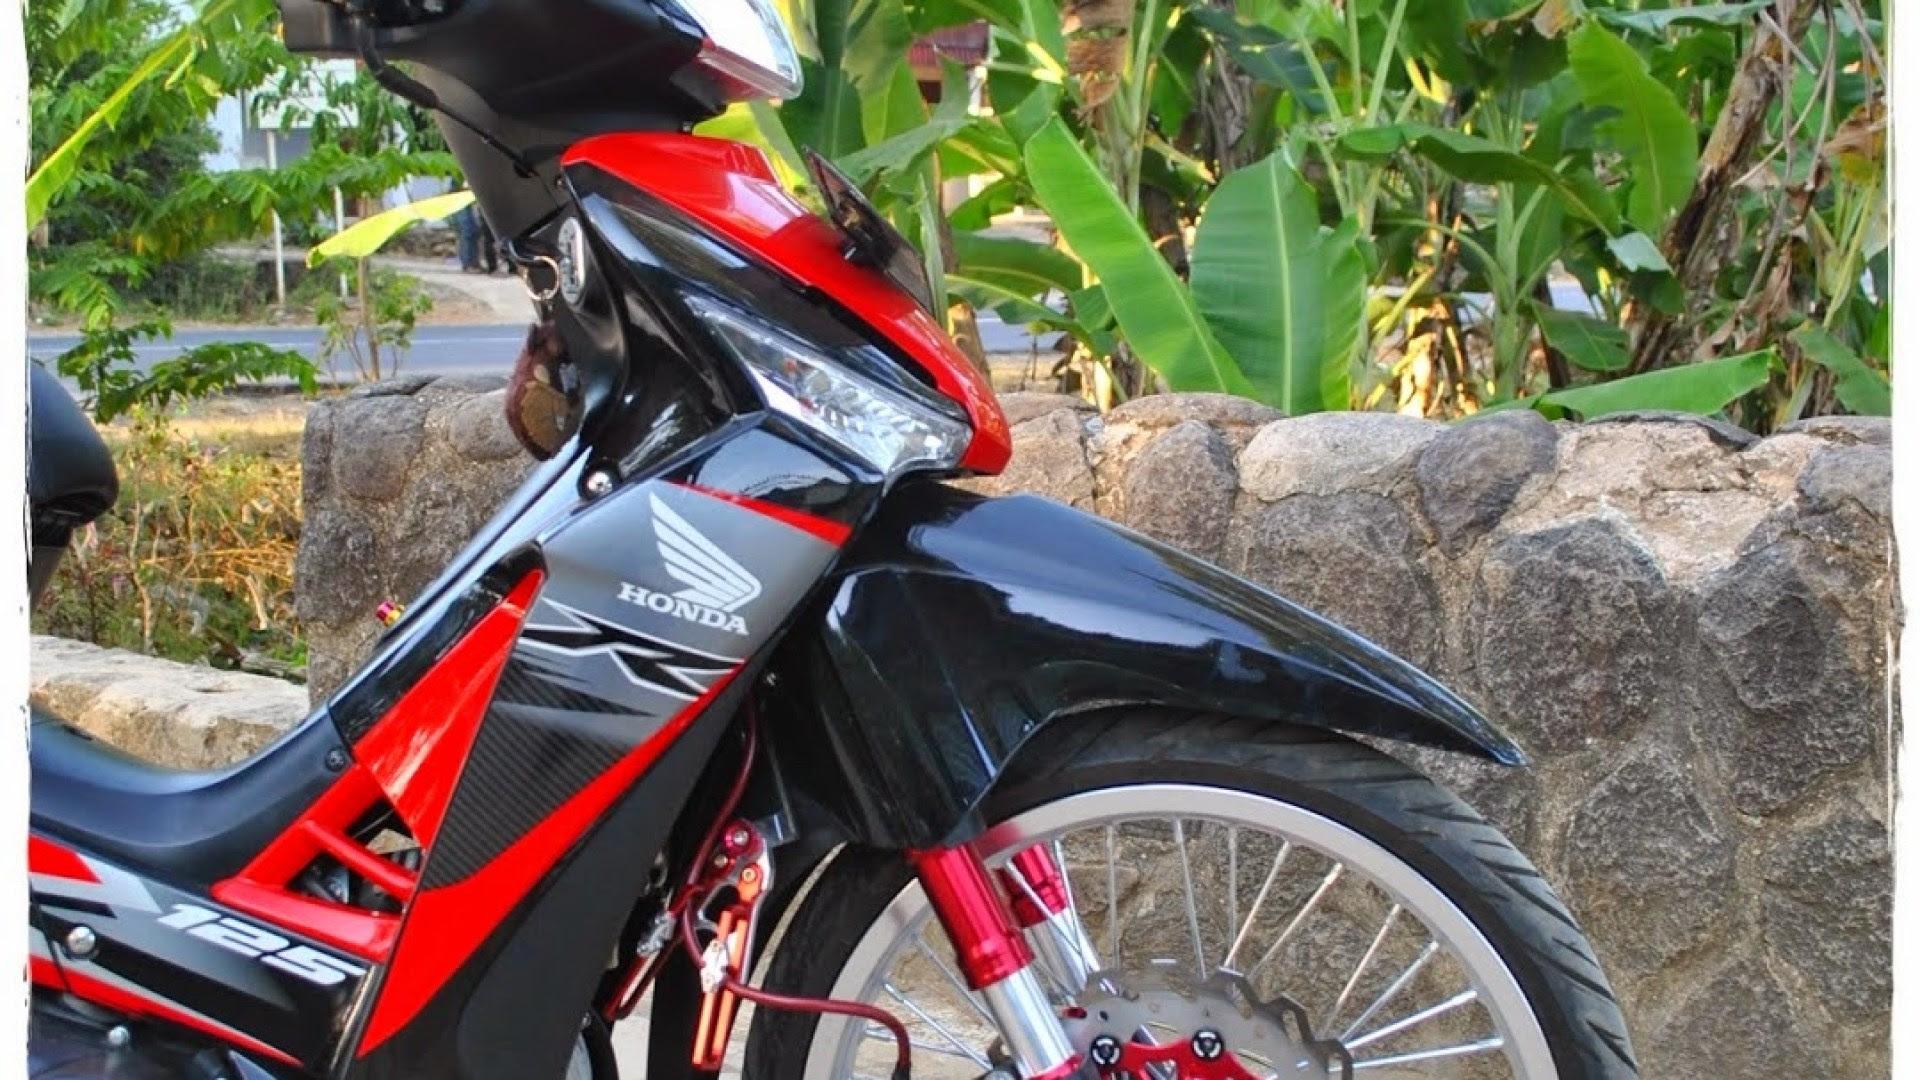 Ide 95 Foto Modif Motor Supra X 125 Fi Terupdate Griya Modifikasi